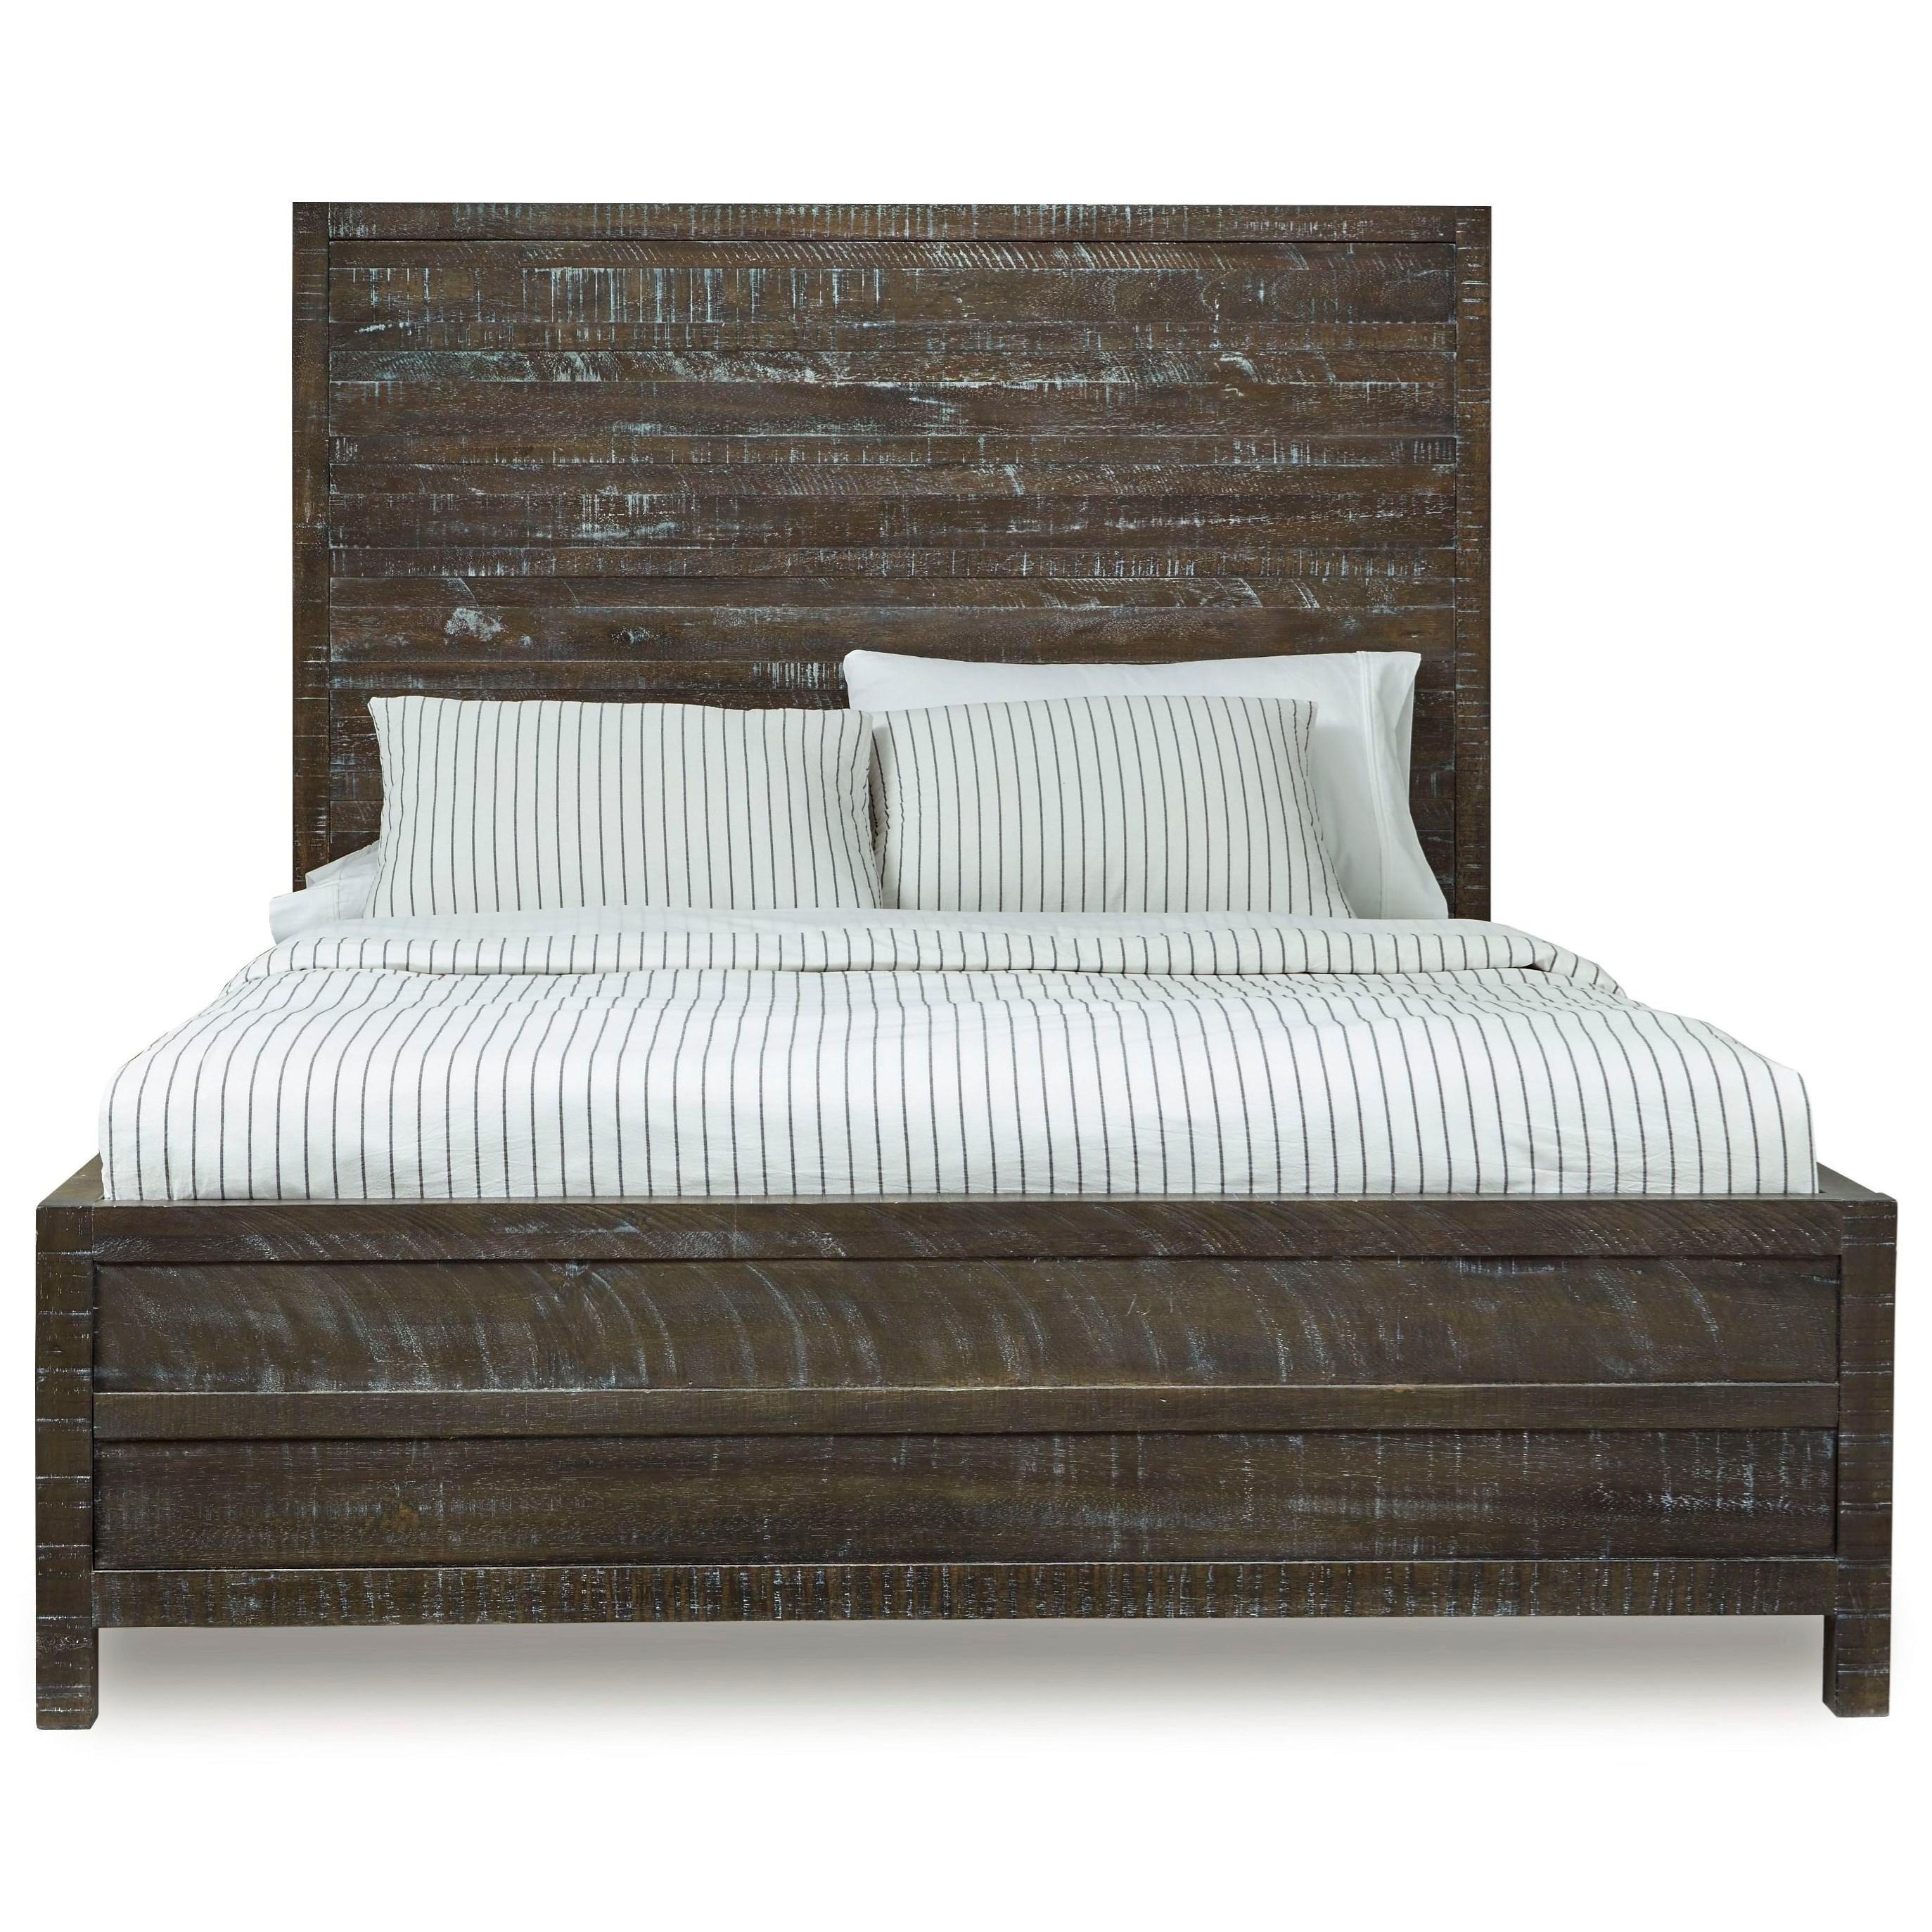 12468 California King Low-Profile Bed at Sadler's Home Furnishings